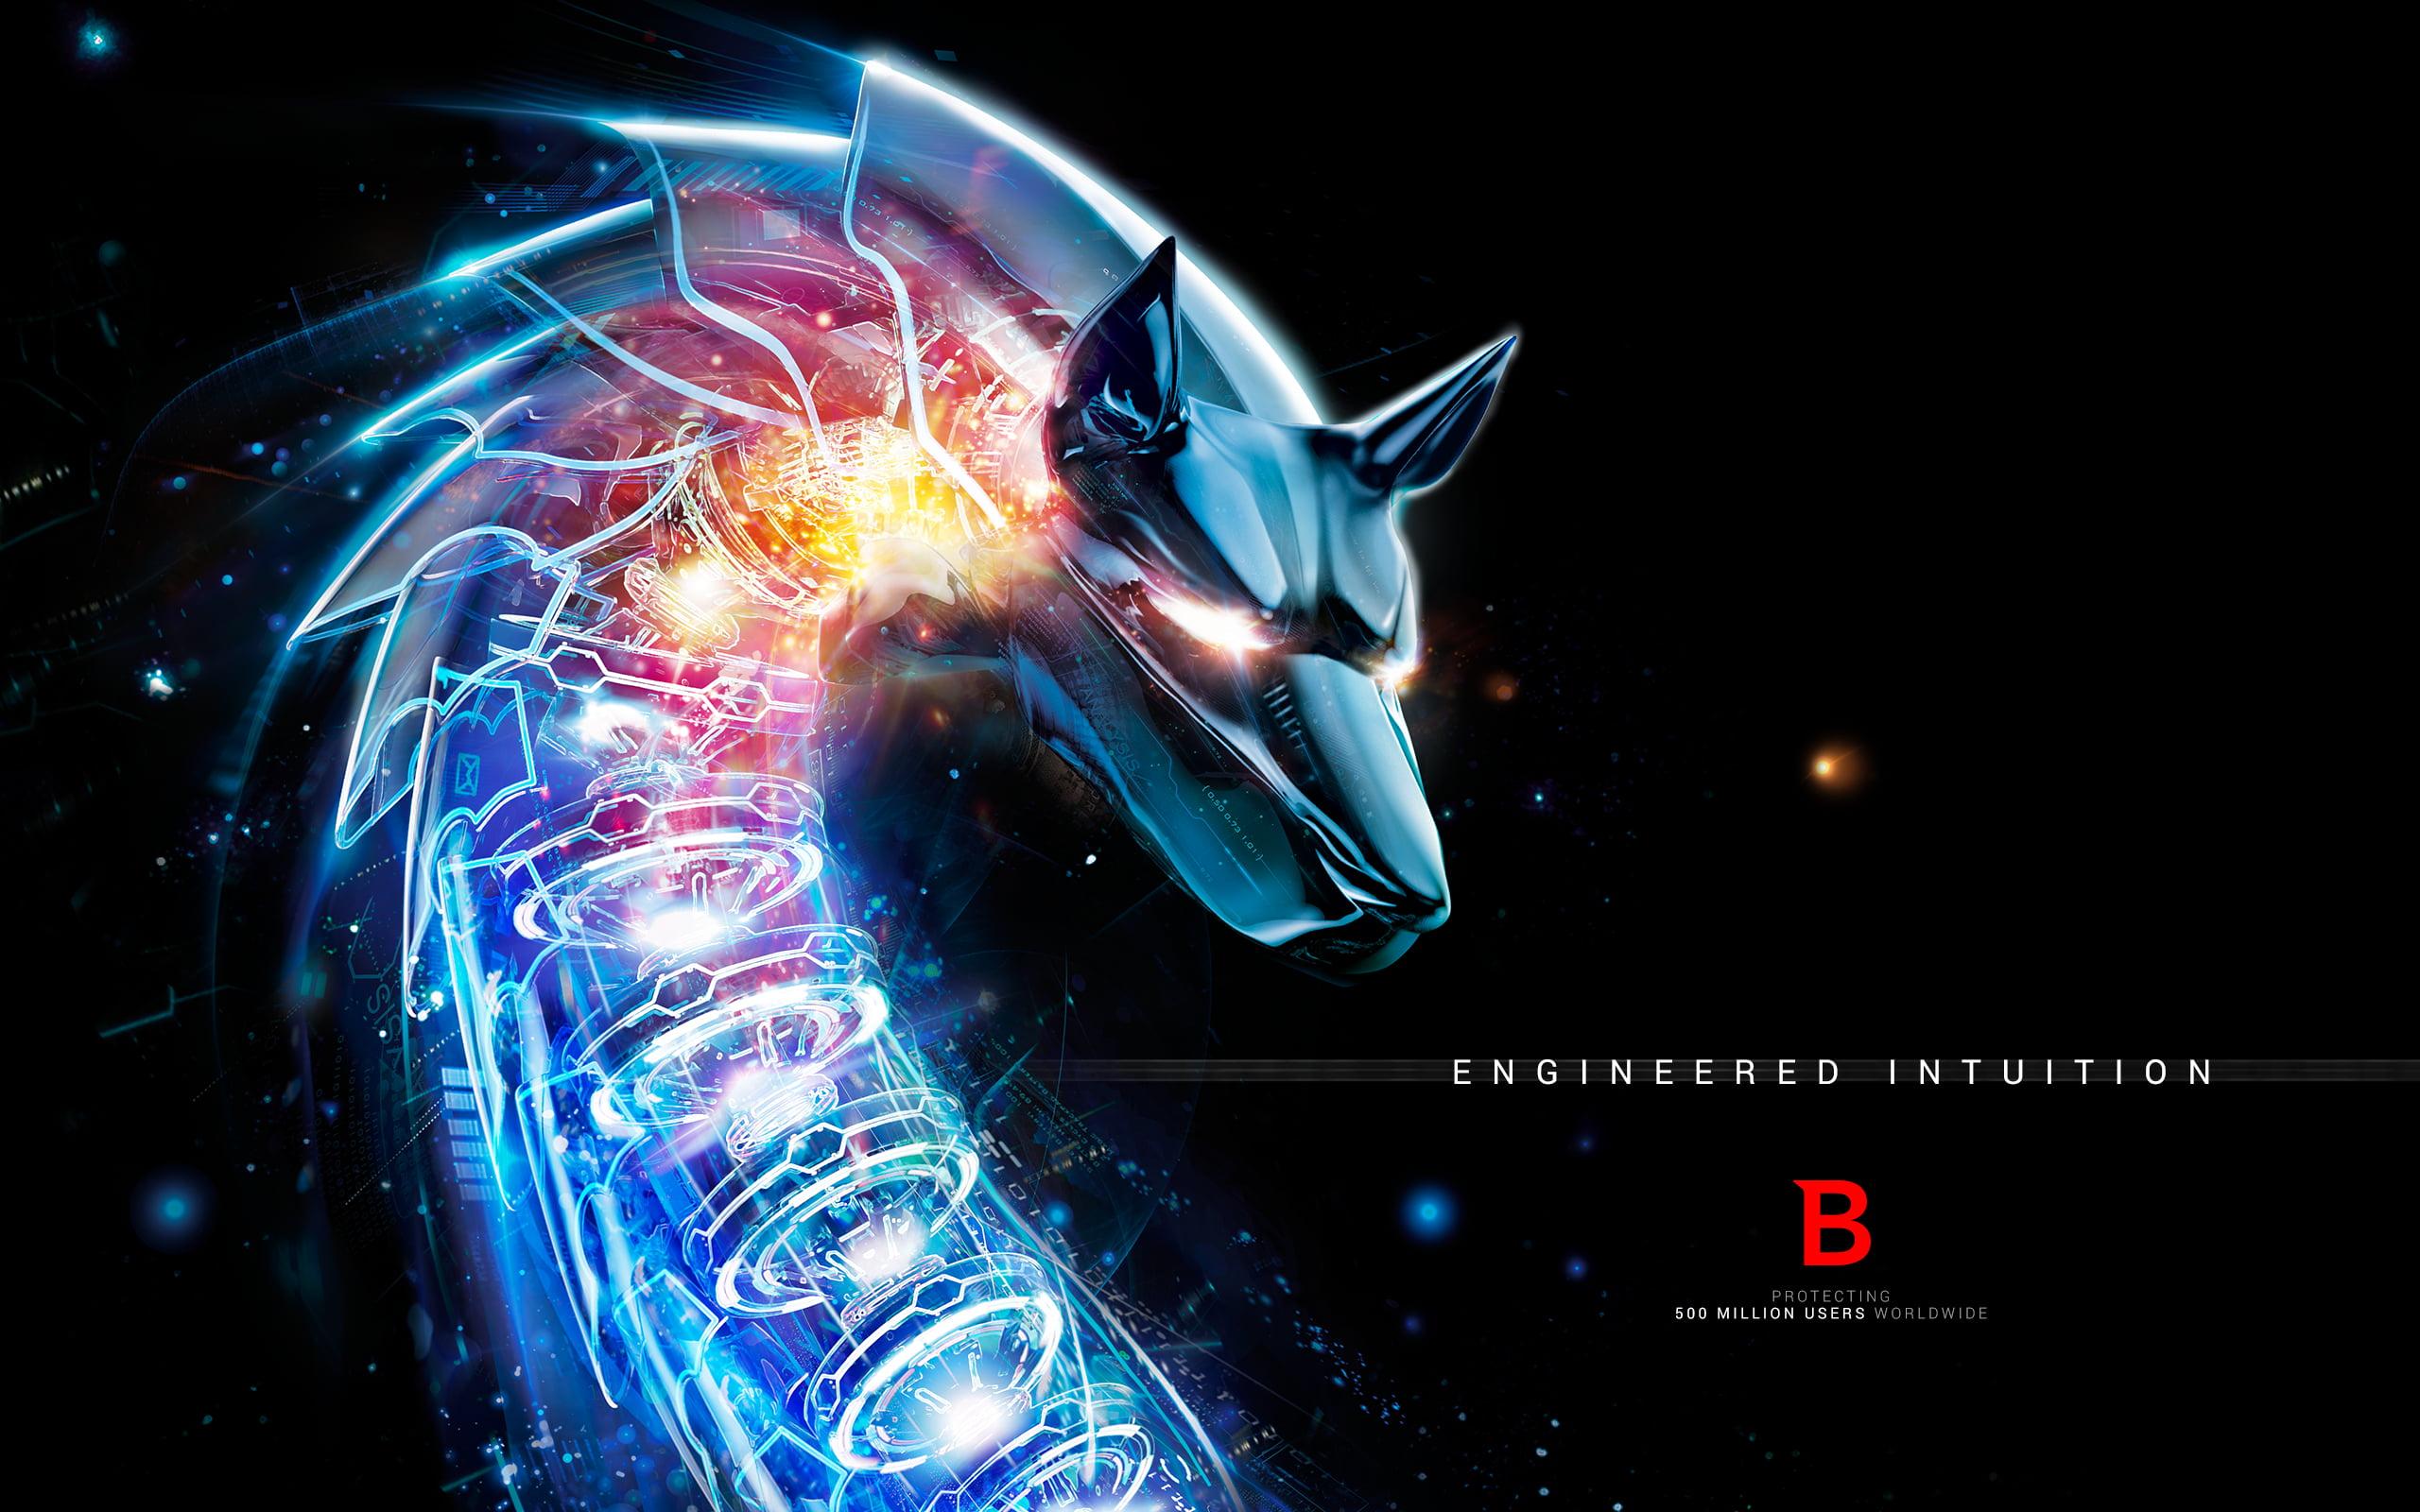 Blue cyber wolf HD wallpaper bitdefender logo HD wallpaper 2560x1600